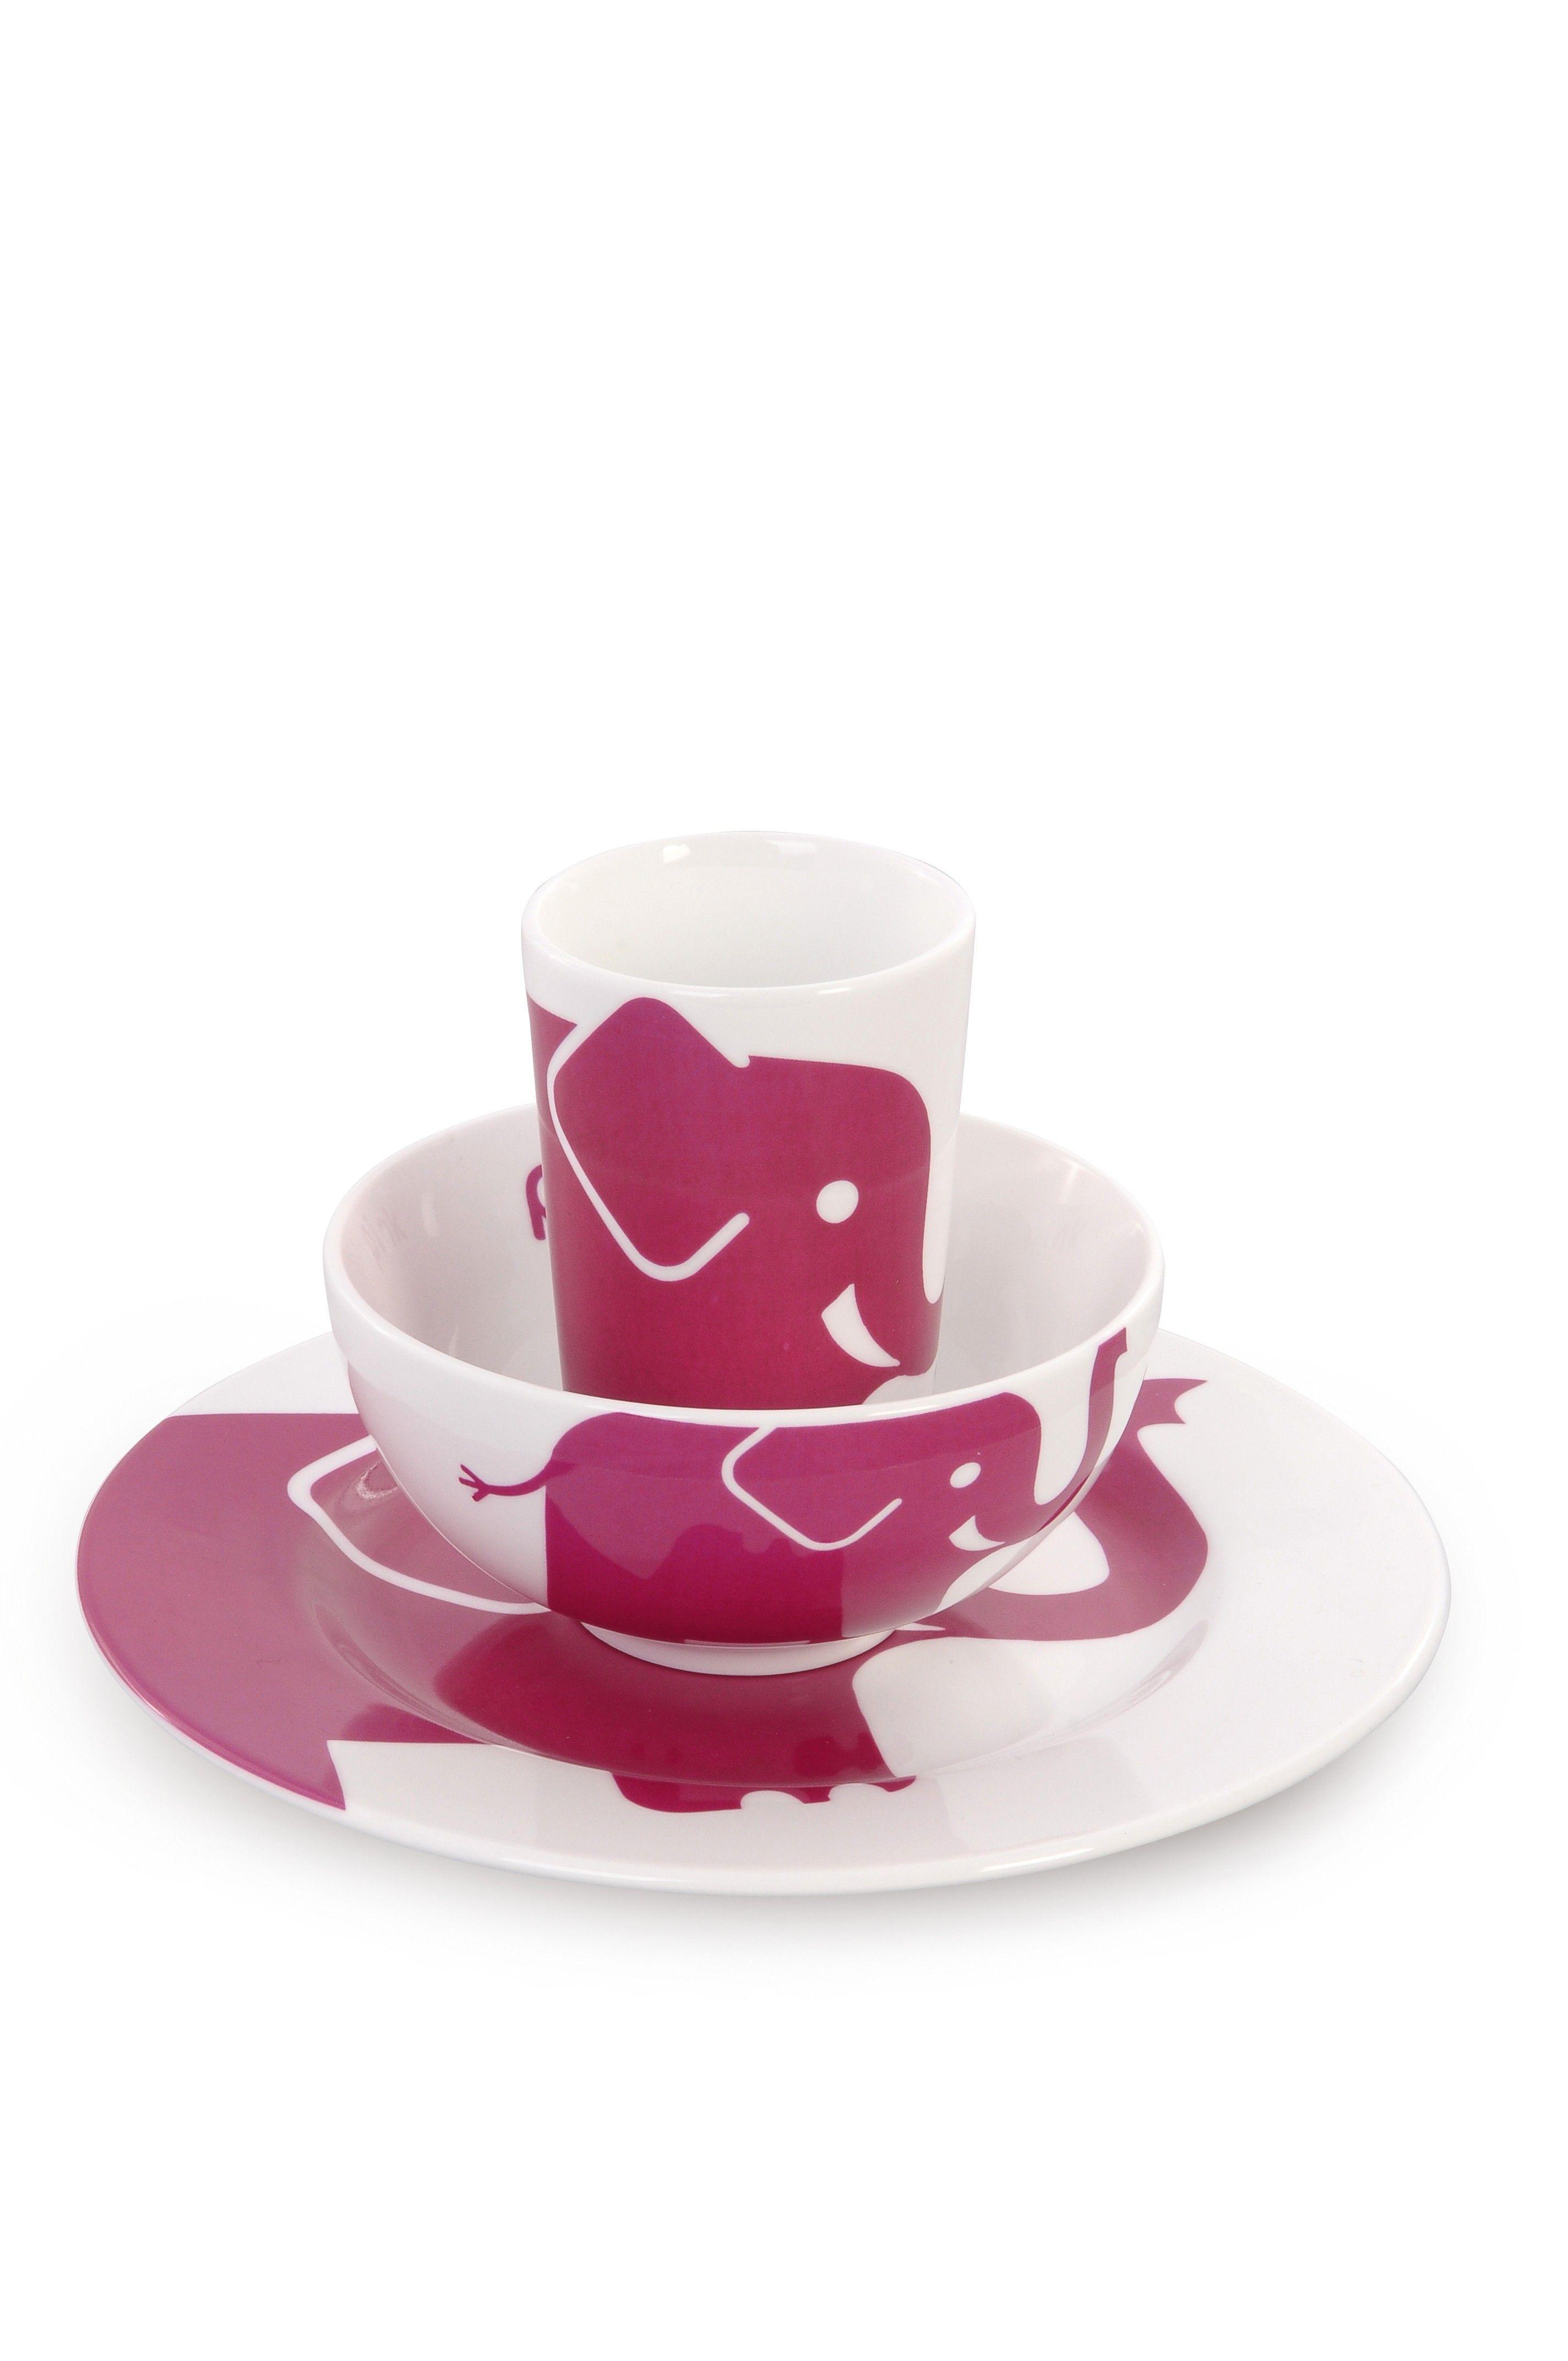 Pink Elephant Childrens Tableware Set From Colourful Dove Pink Elephant Childrens Tableware Set From Colourful Dove In 2020 Tableware Set Tableware Tableware Design